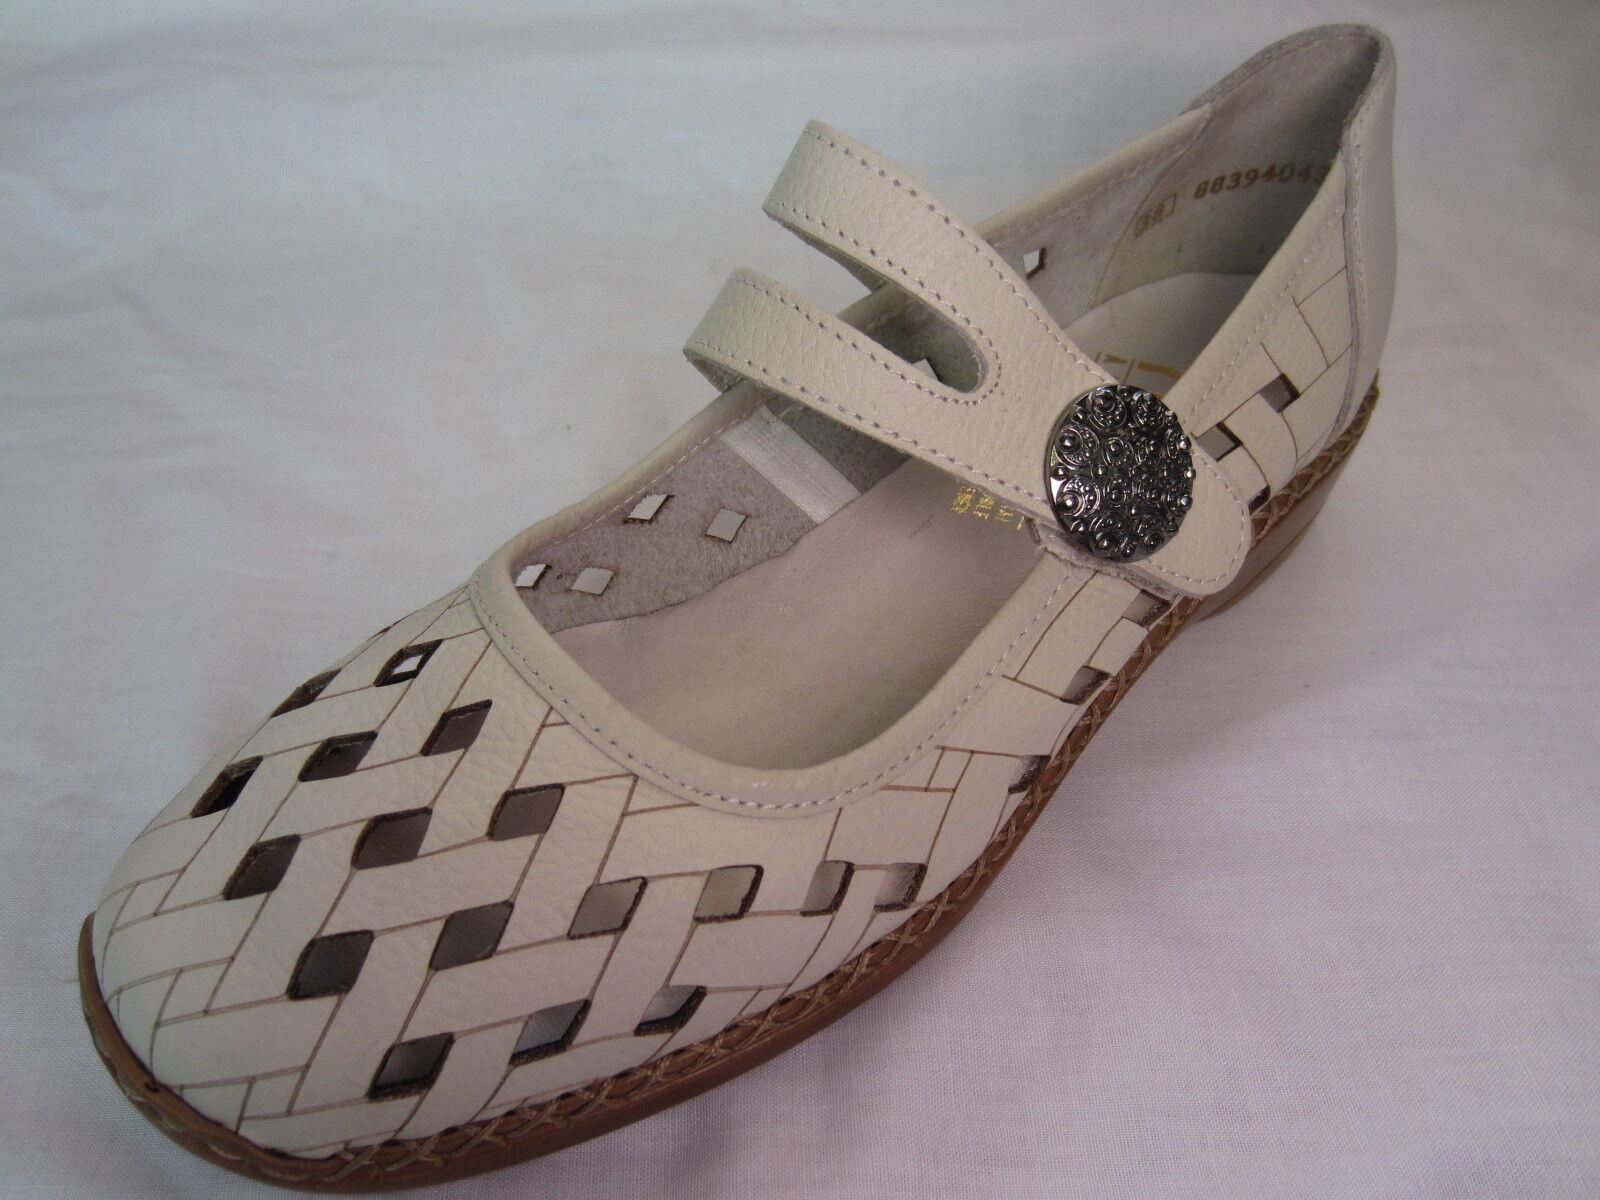 Rieker '41375-80' '41375-80' Rieker Ladies White Leather Summer Shoes bfaa85